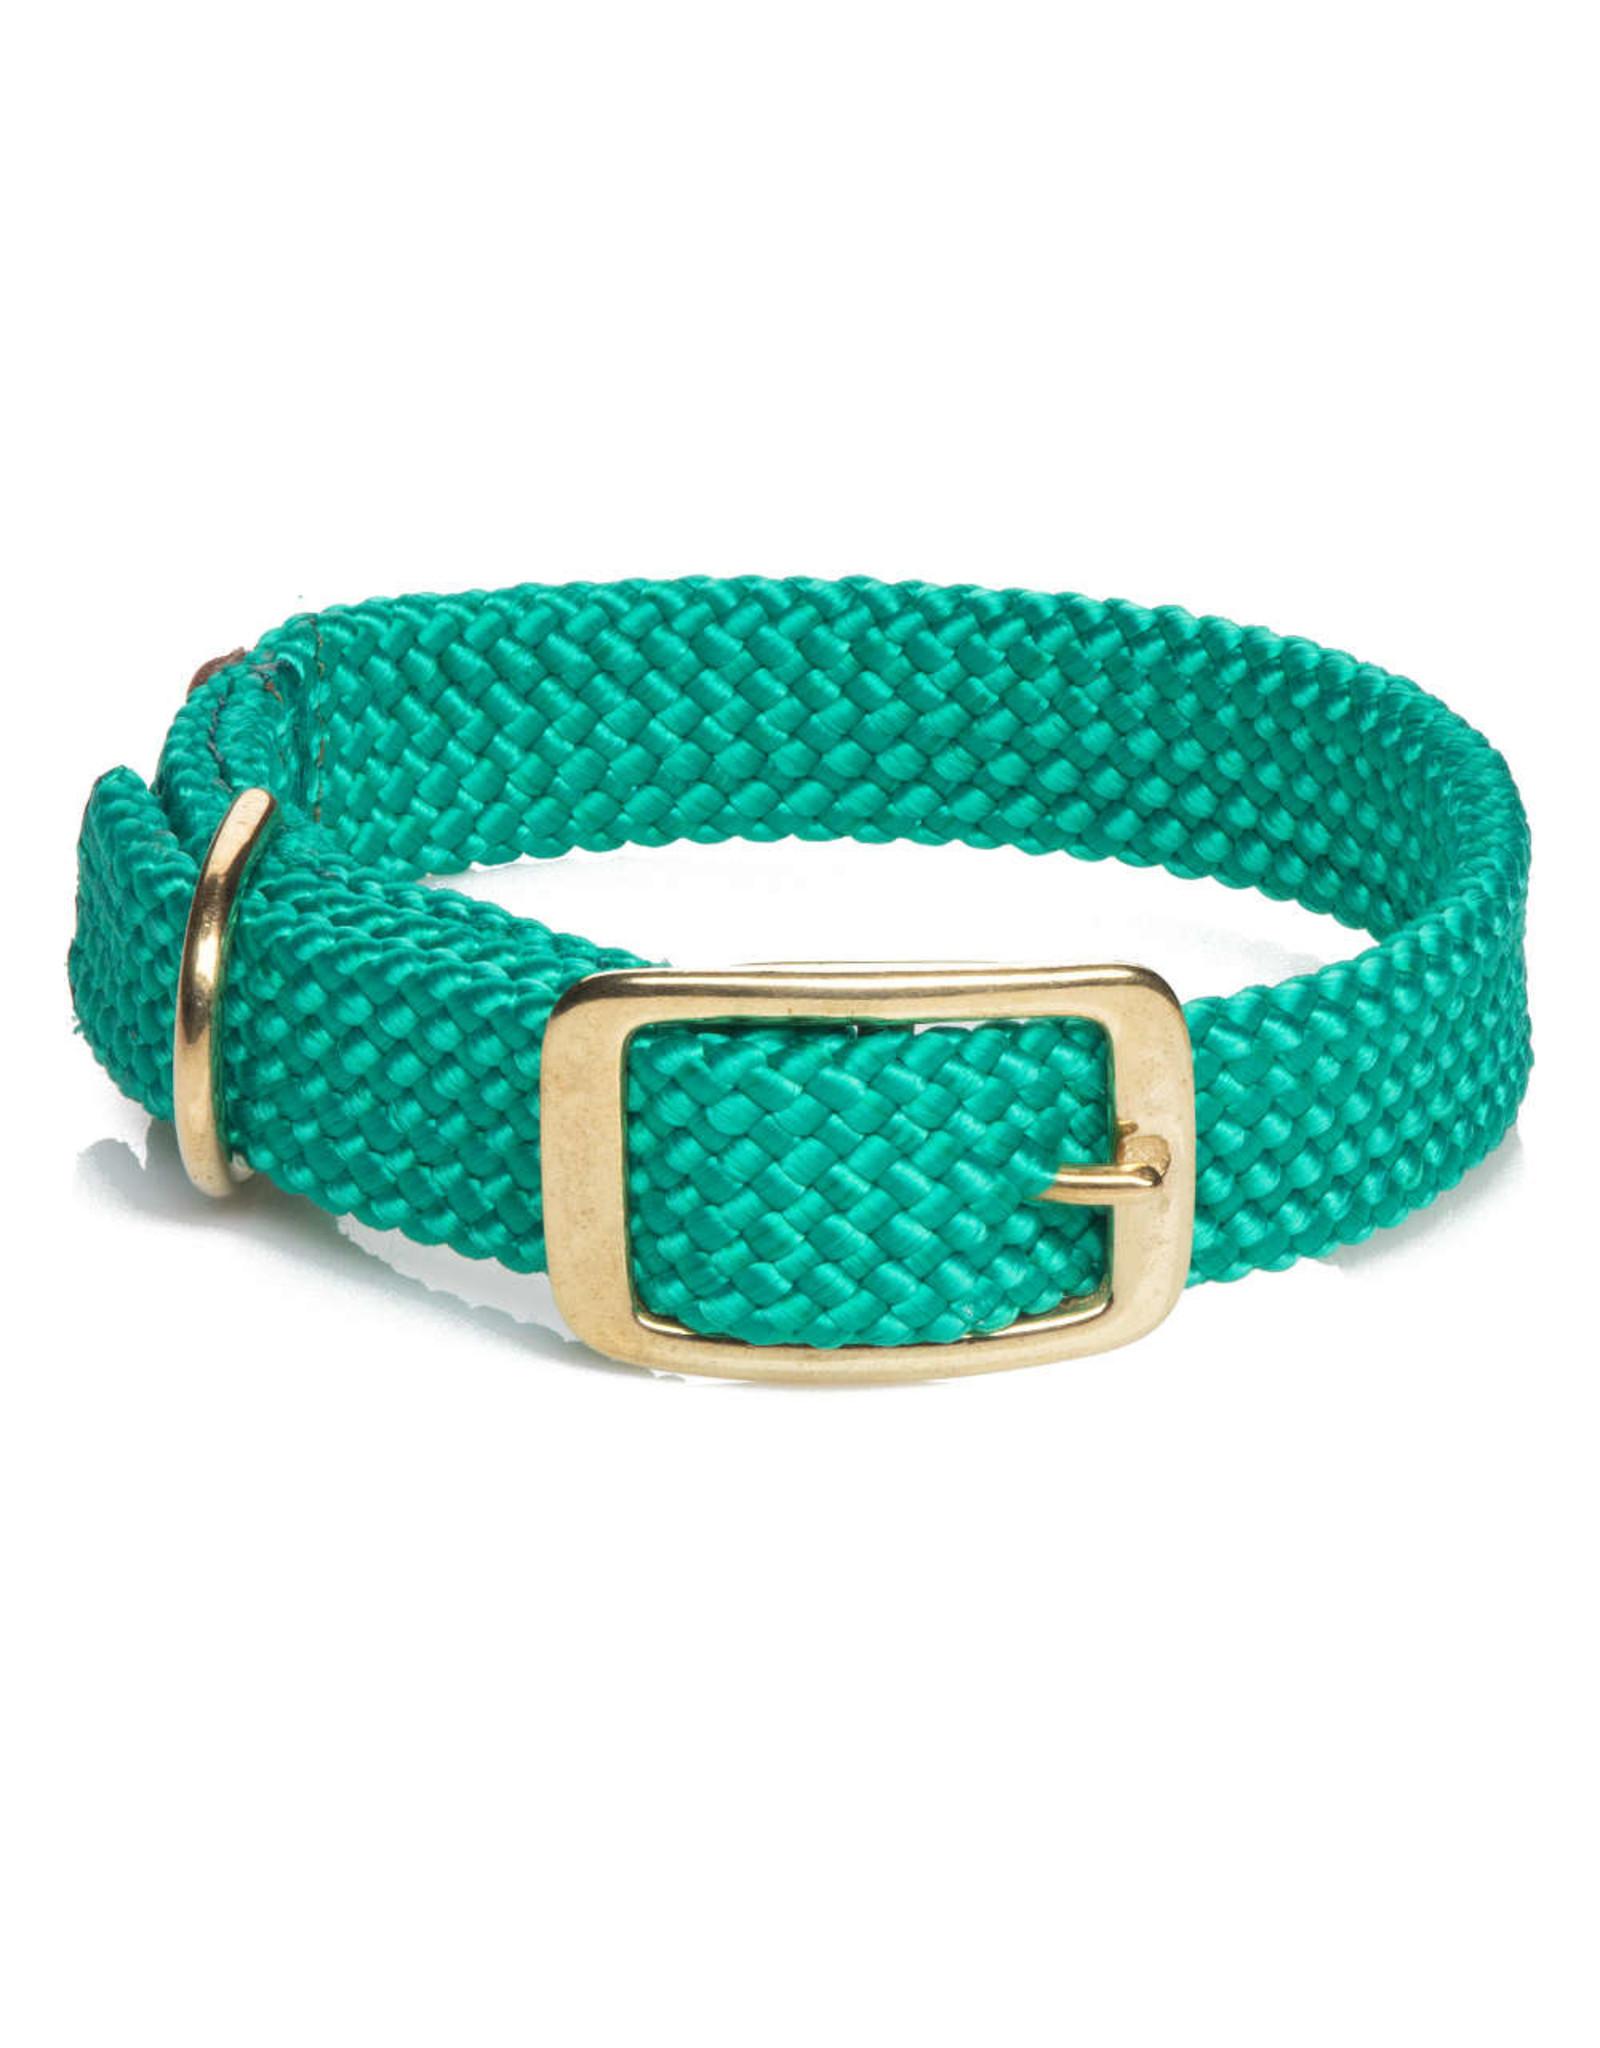 "Mendota Mendota Double-Braid Collar KELLY GREEN 1""x18"""